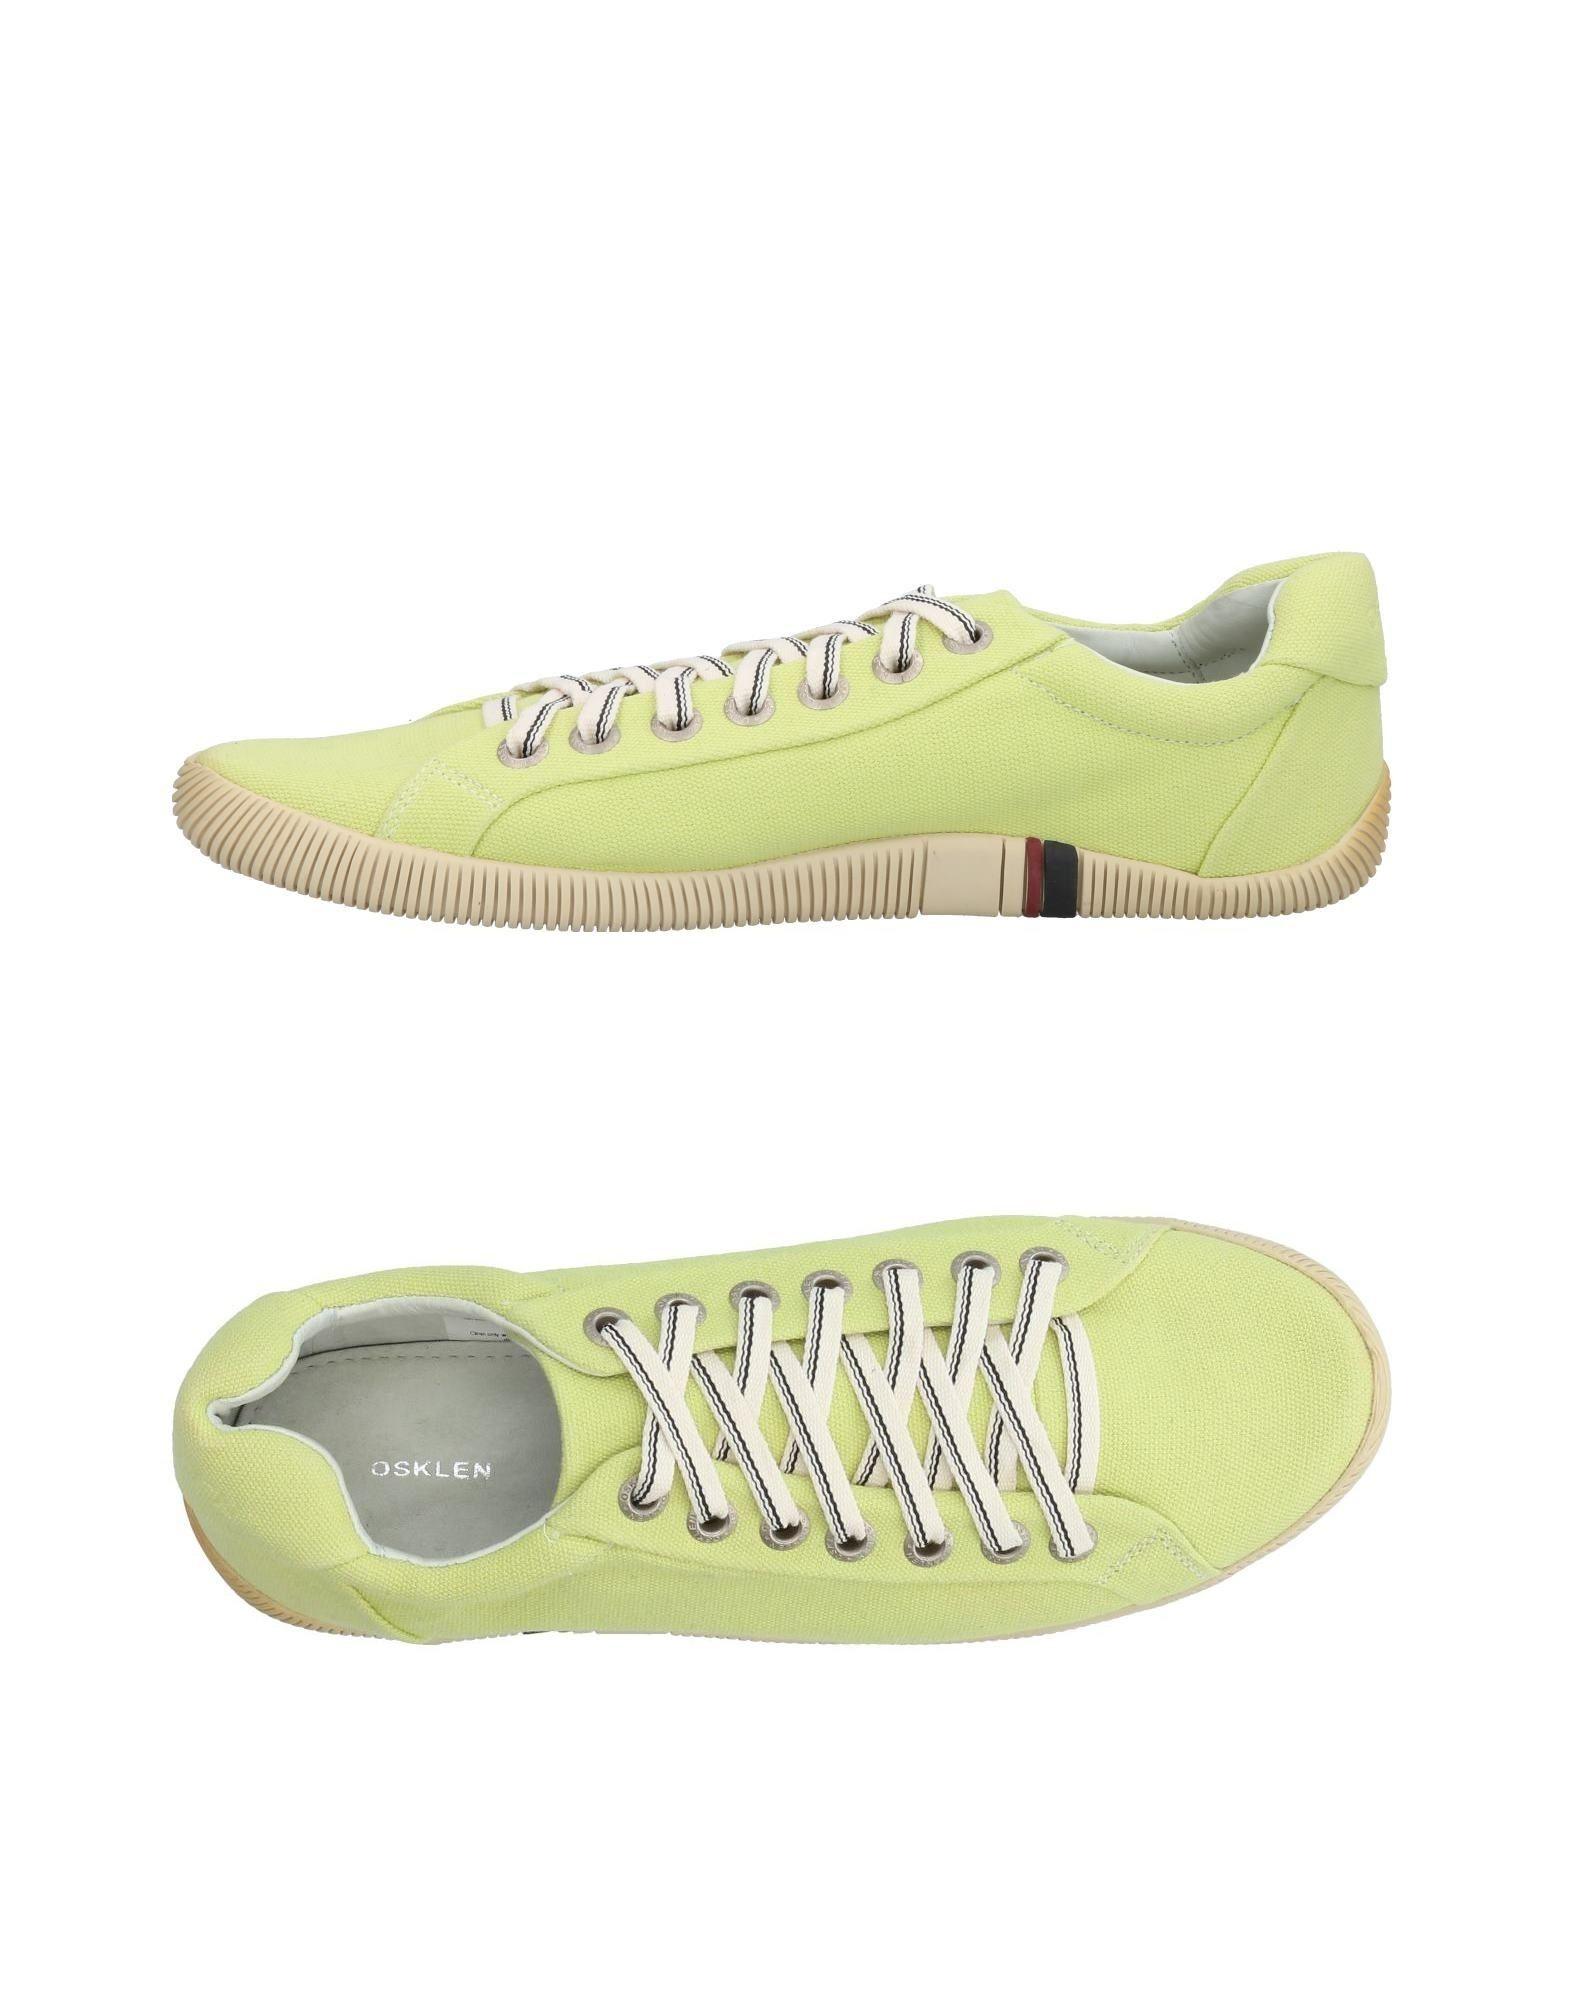 A buon mercato Sneakers Osklen Uomo - 11410961WE